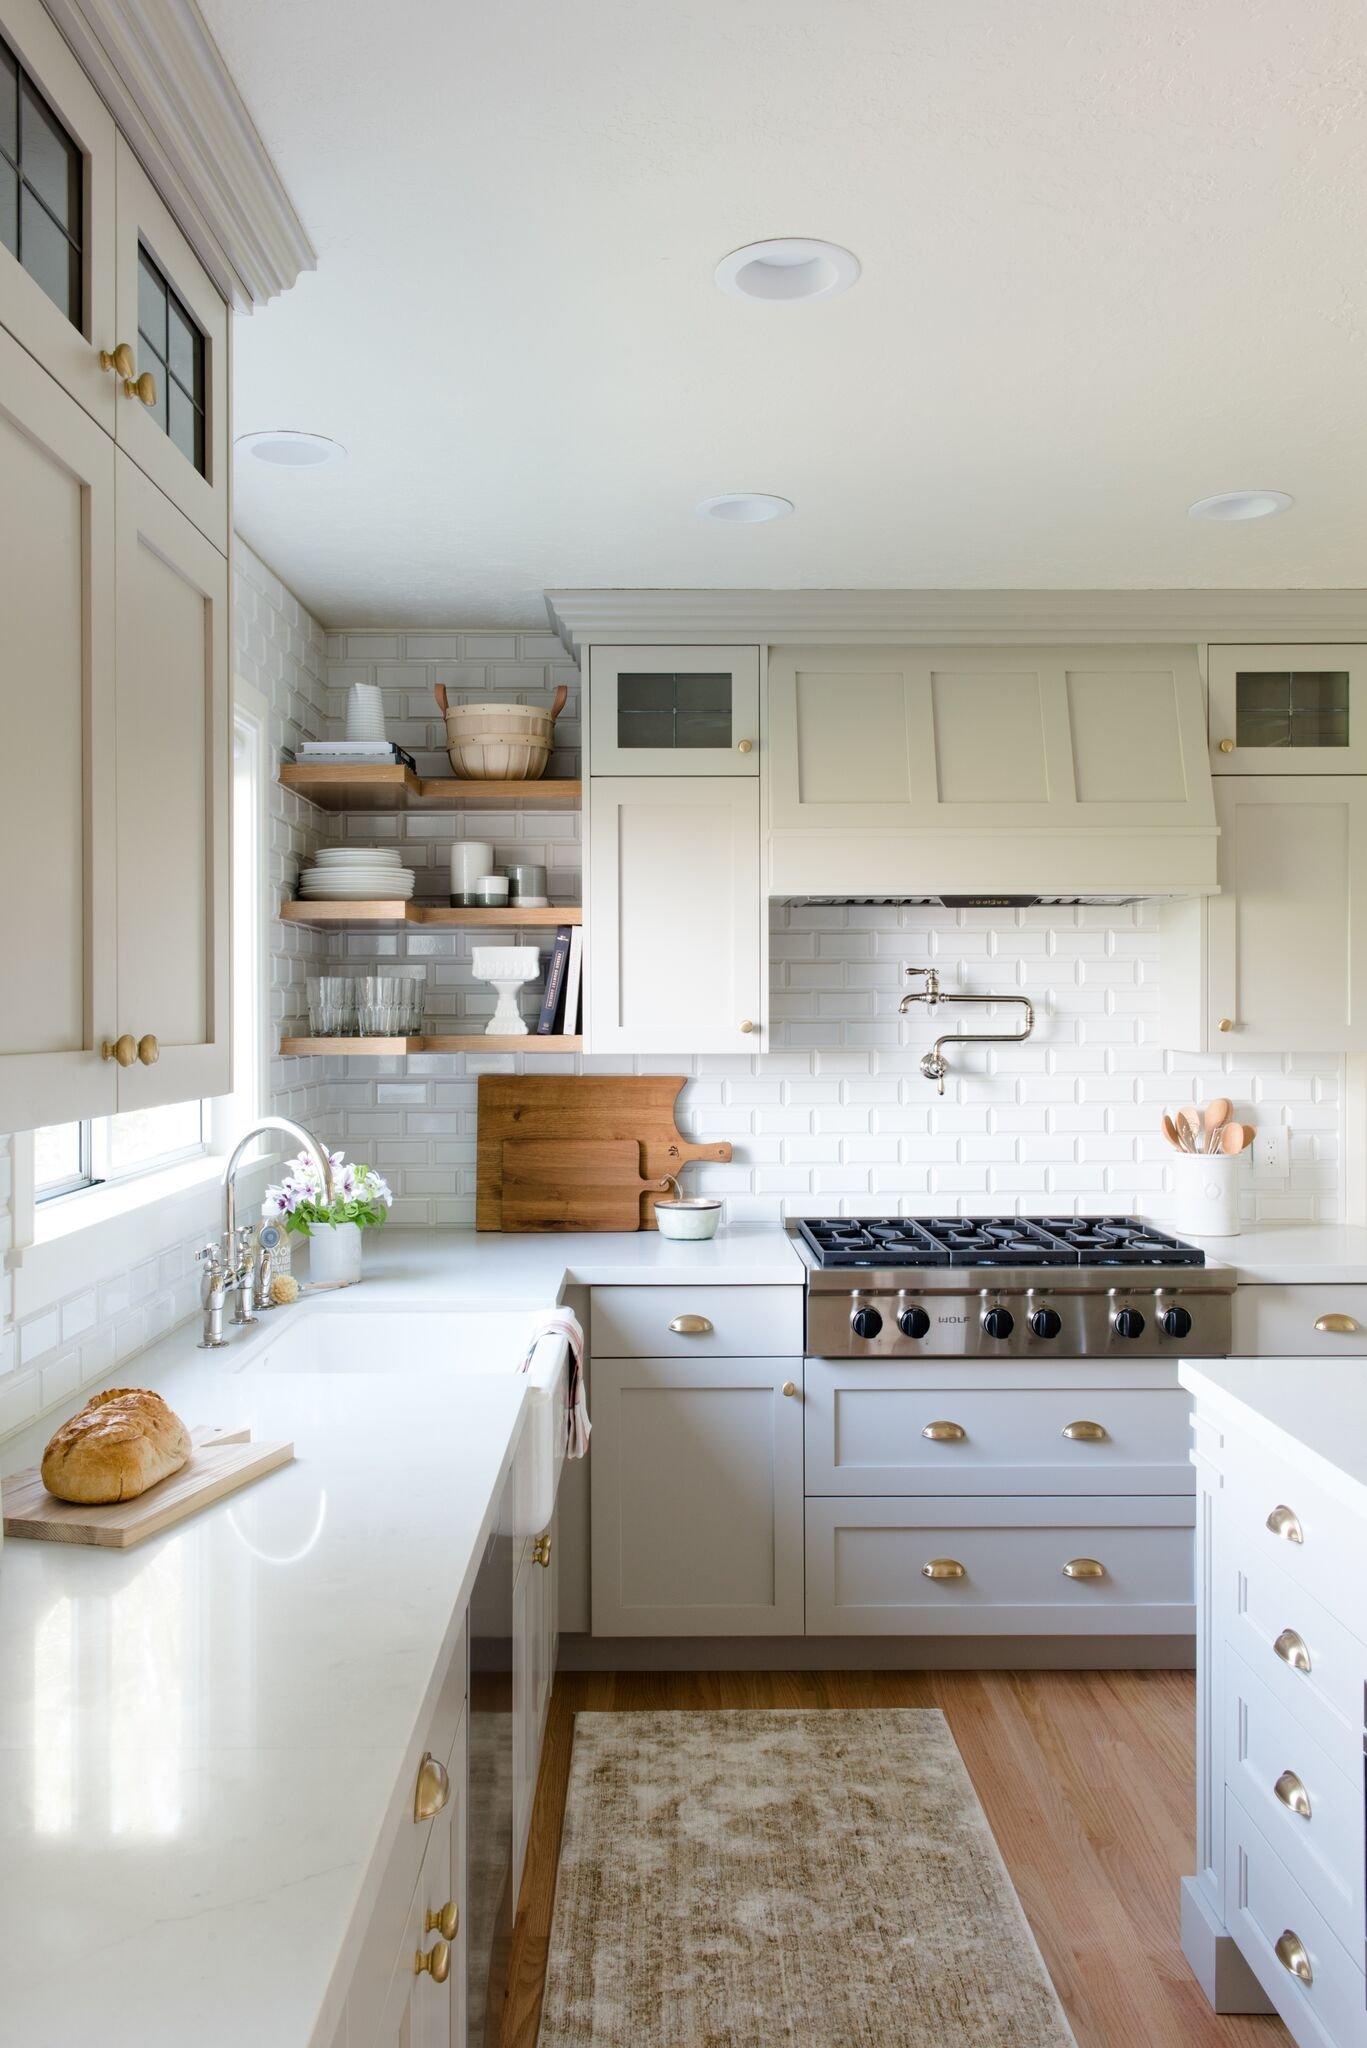 Evergreen Kitchen Remodel Reveal — STUDIO MCGEE